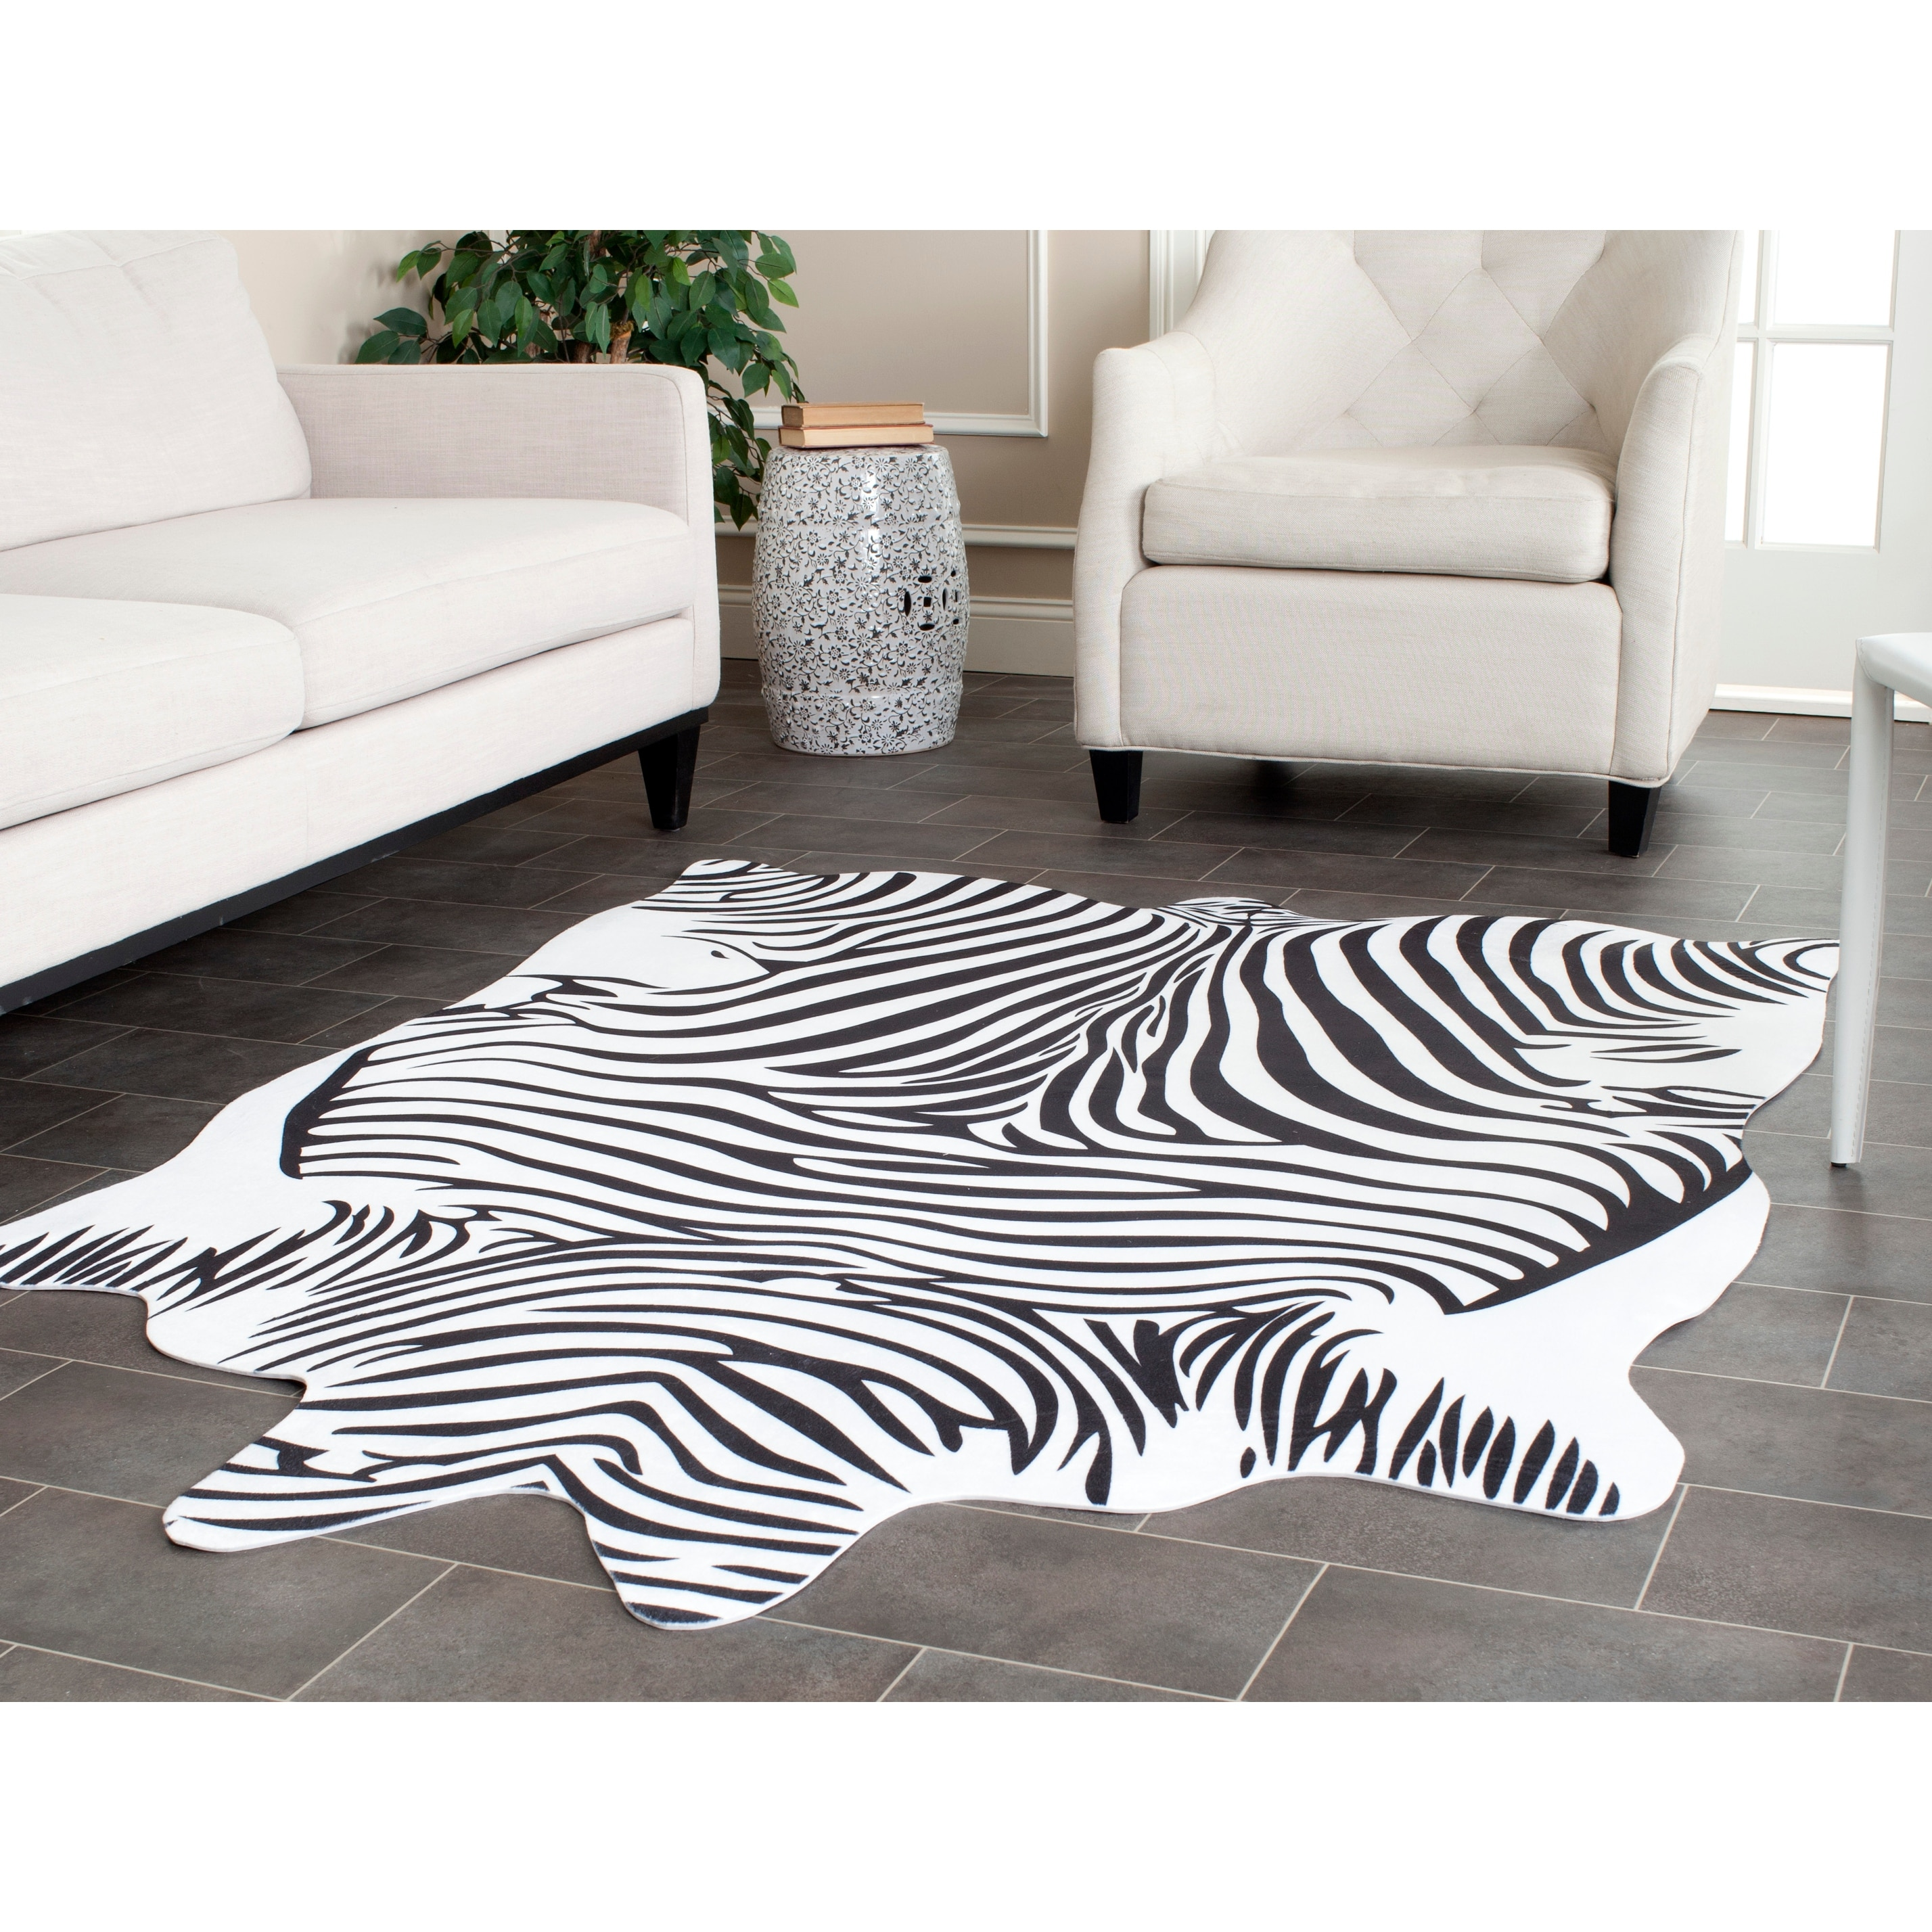 Safavieh Faux Zebra Black White